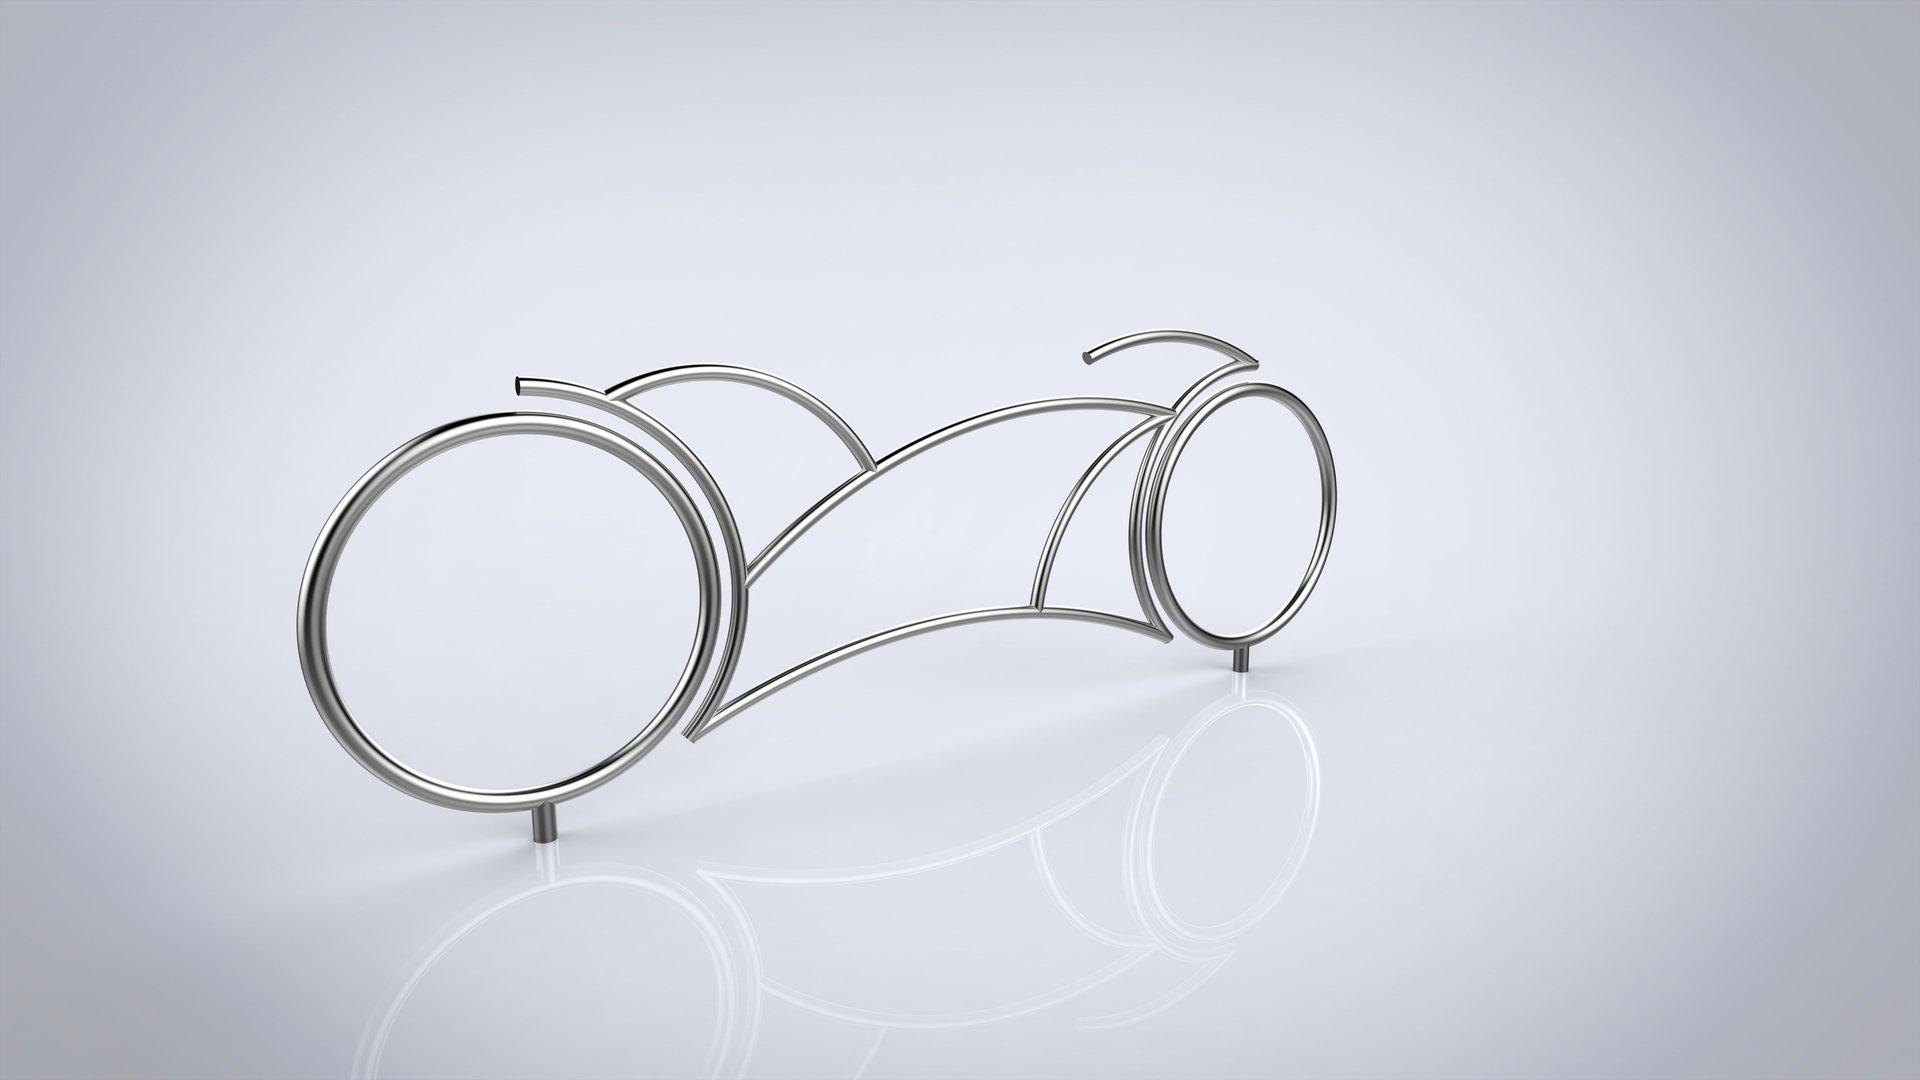 Metall-Design-Minuth - Frank & Stefan Minuth GbR